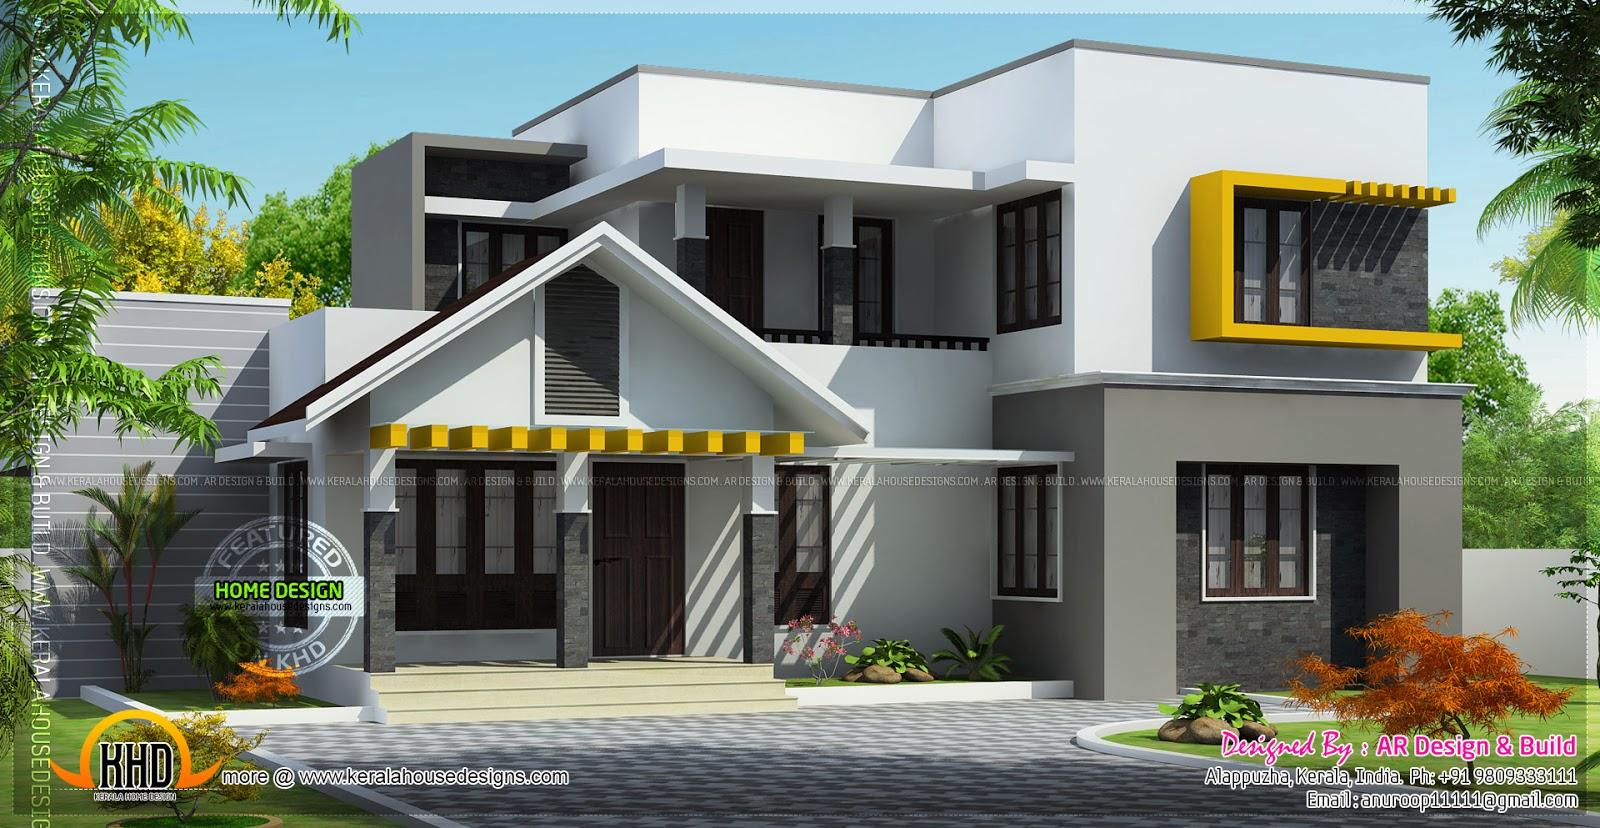 Home Design 1500 Sq Ft Homeriview